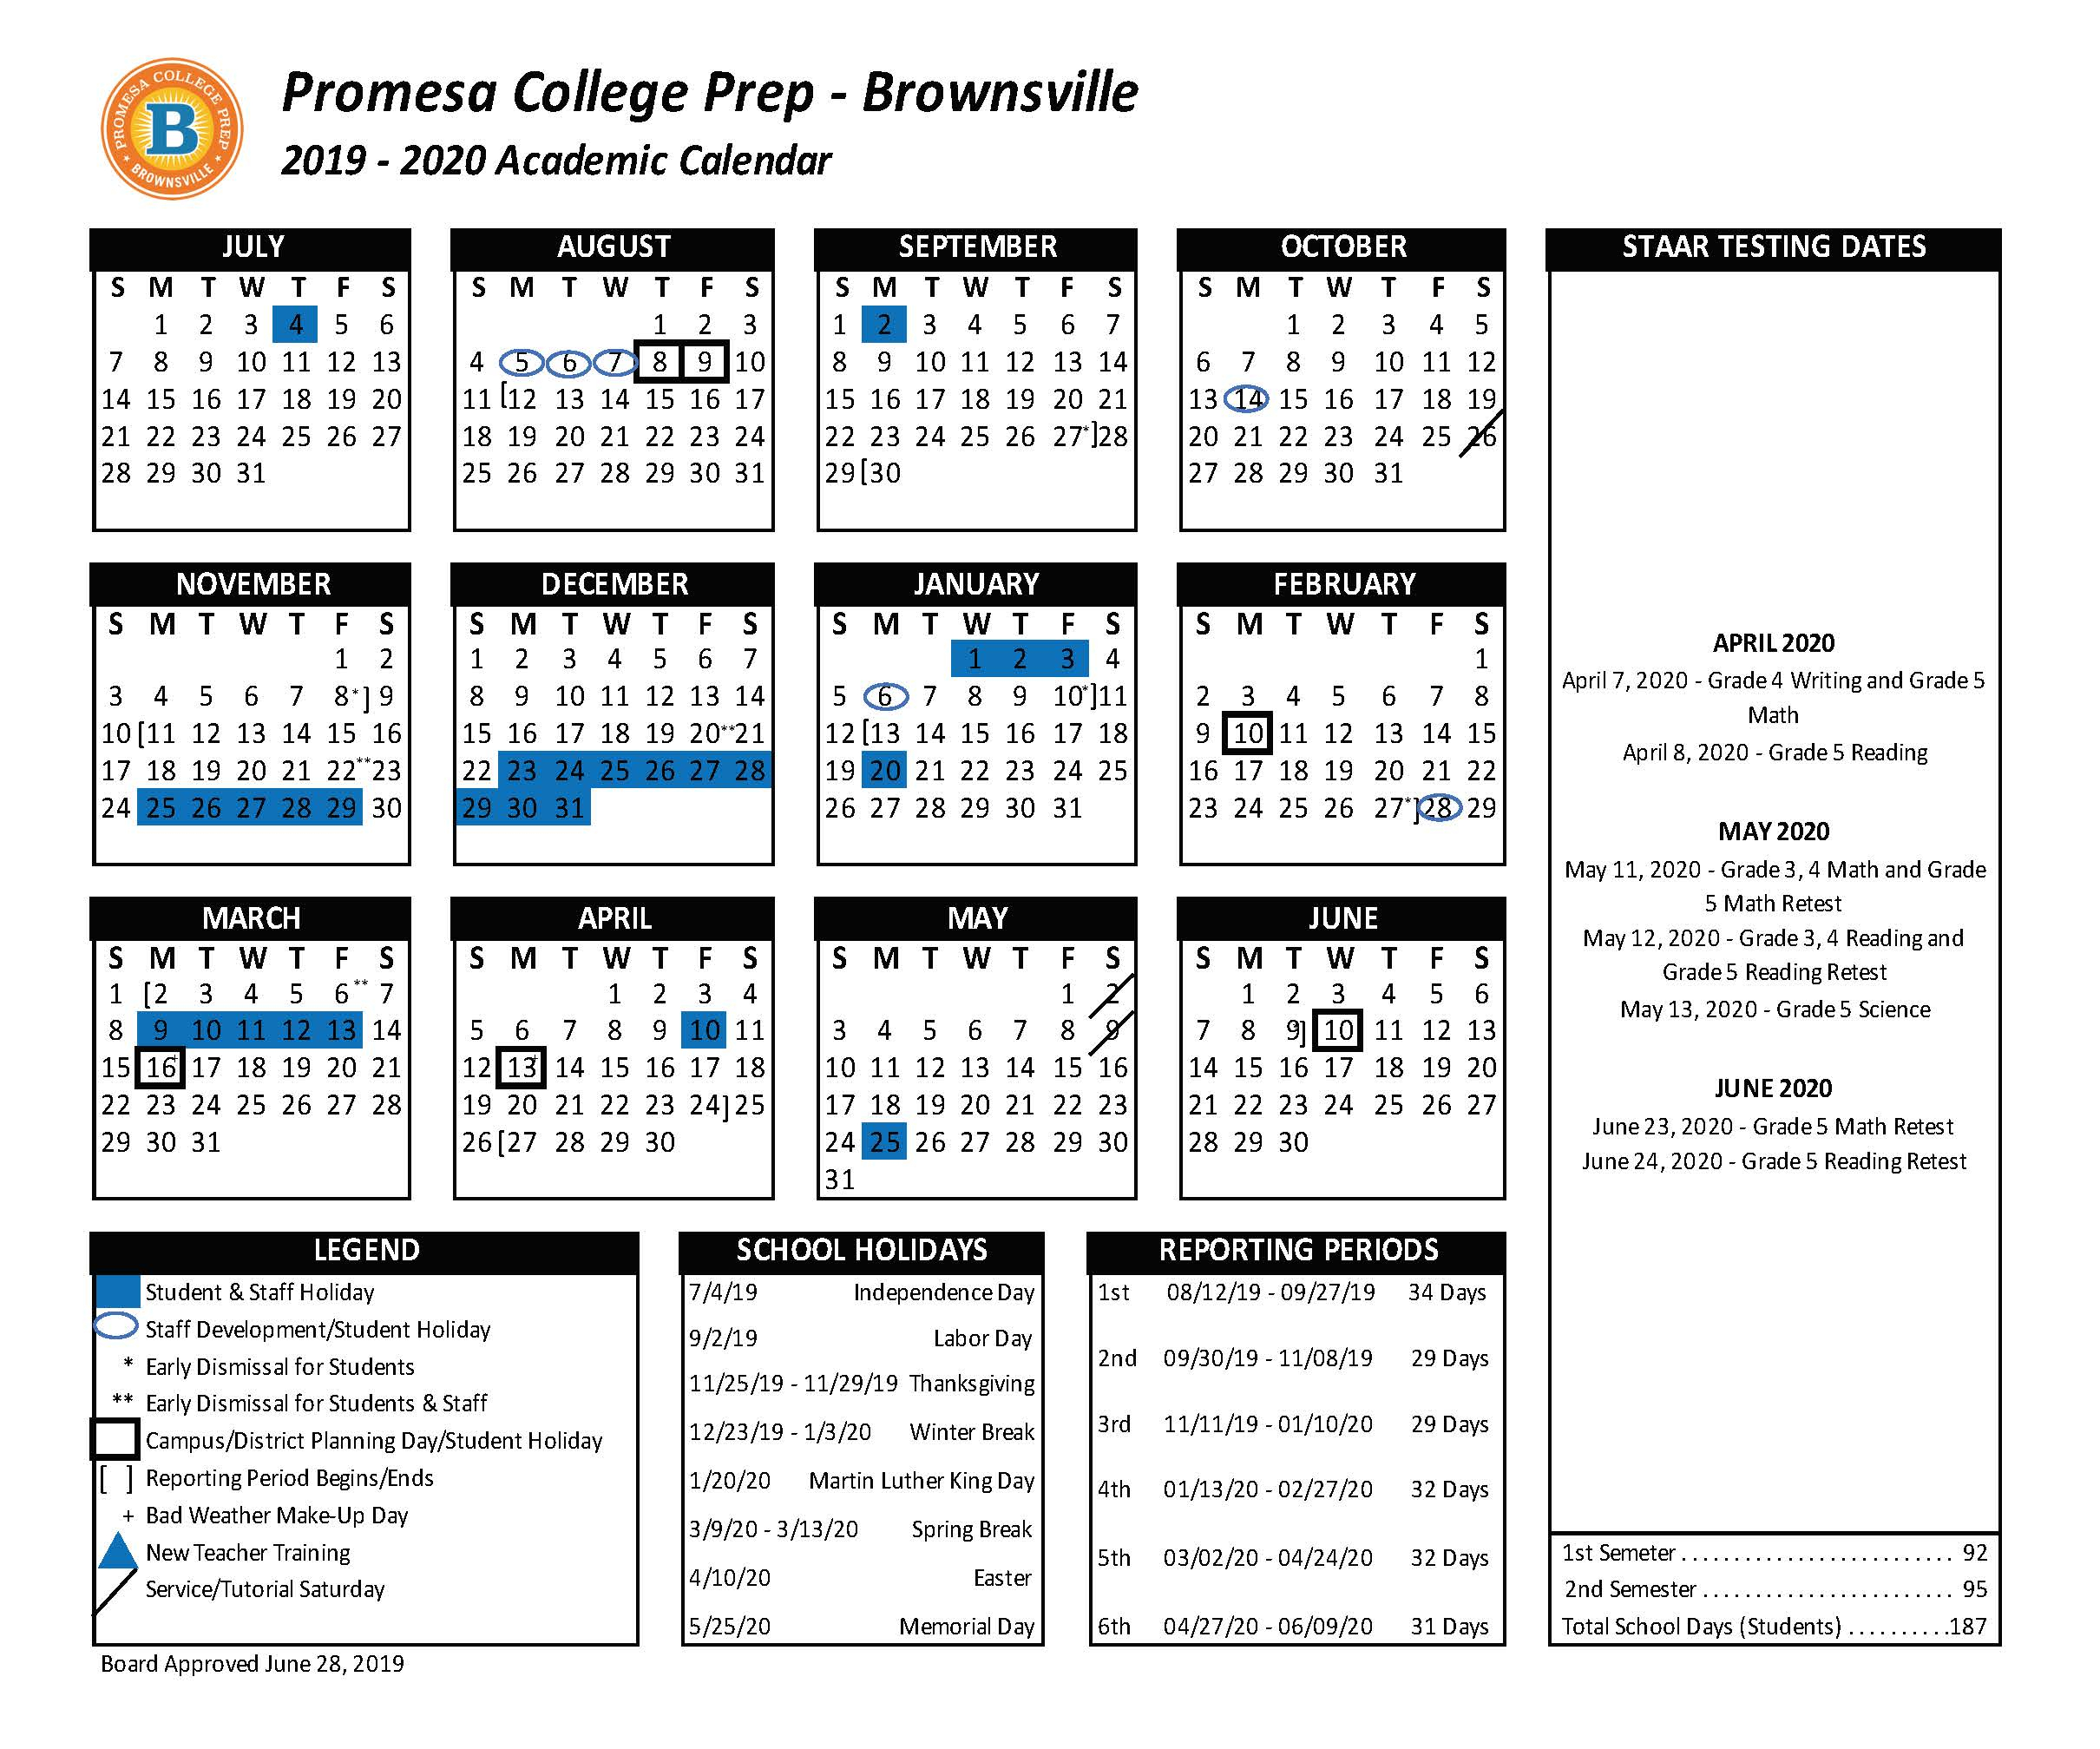 Create A Recurring Task In Google Calendar | Printable In Academic Calendar 2021 2020 University Of Central Florida